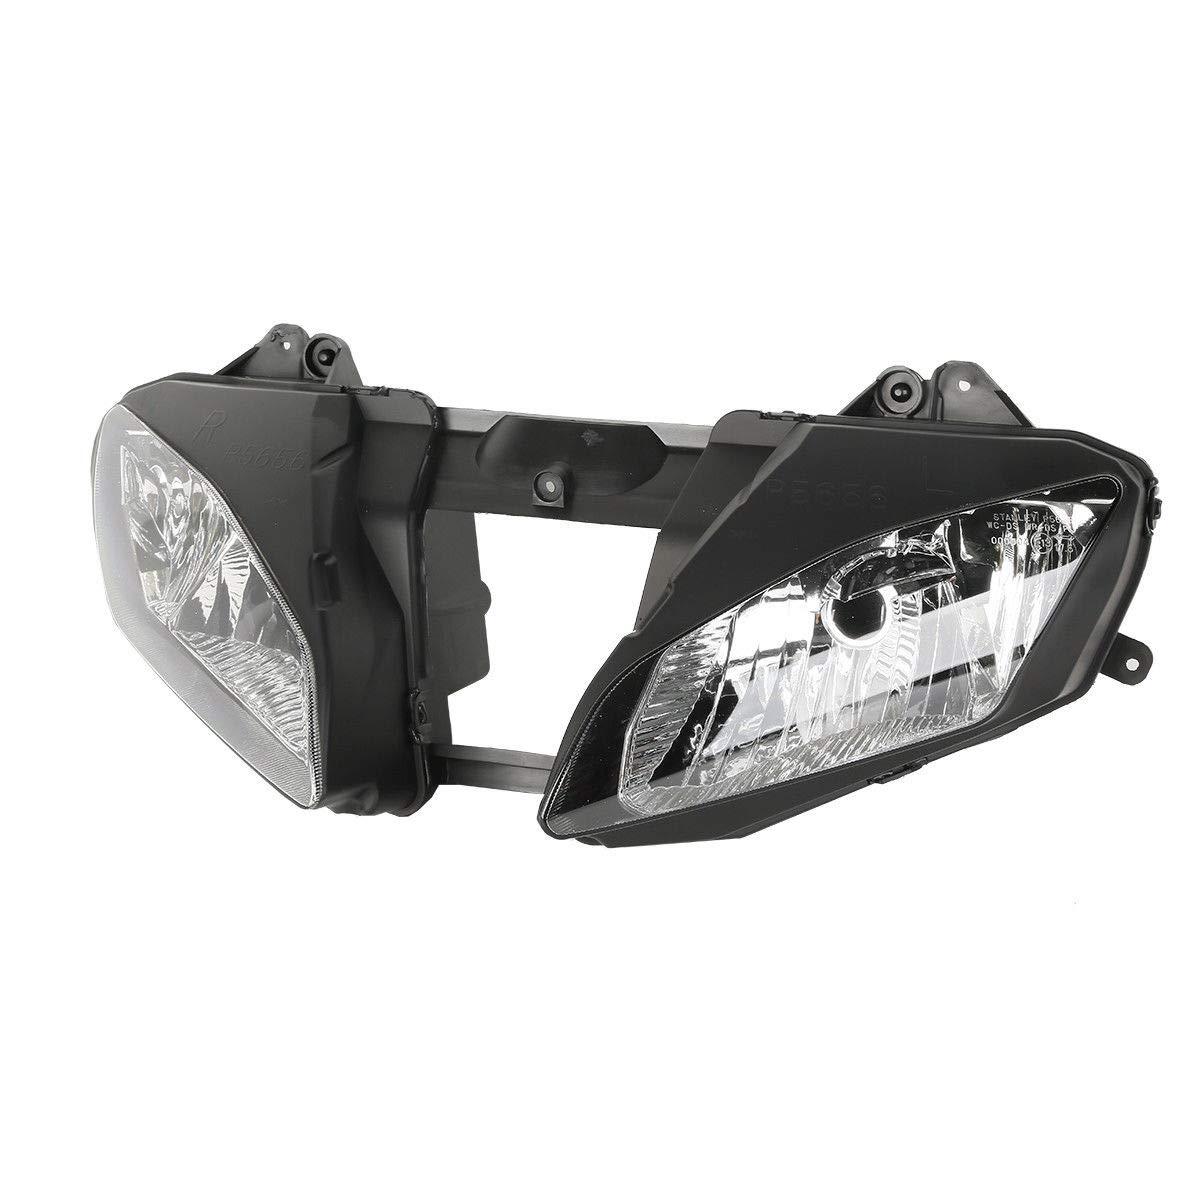 TCMT Black Front Headlight Head Light Lamp Fits For Yamaha YZF-R6 YZFR6 2006-2007